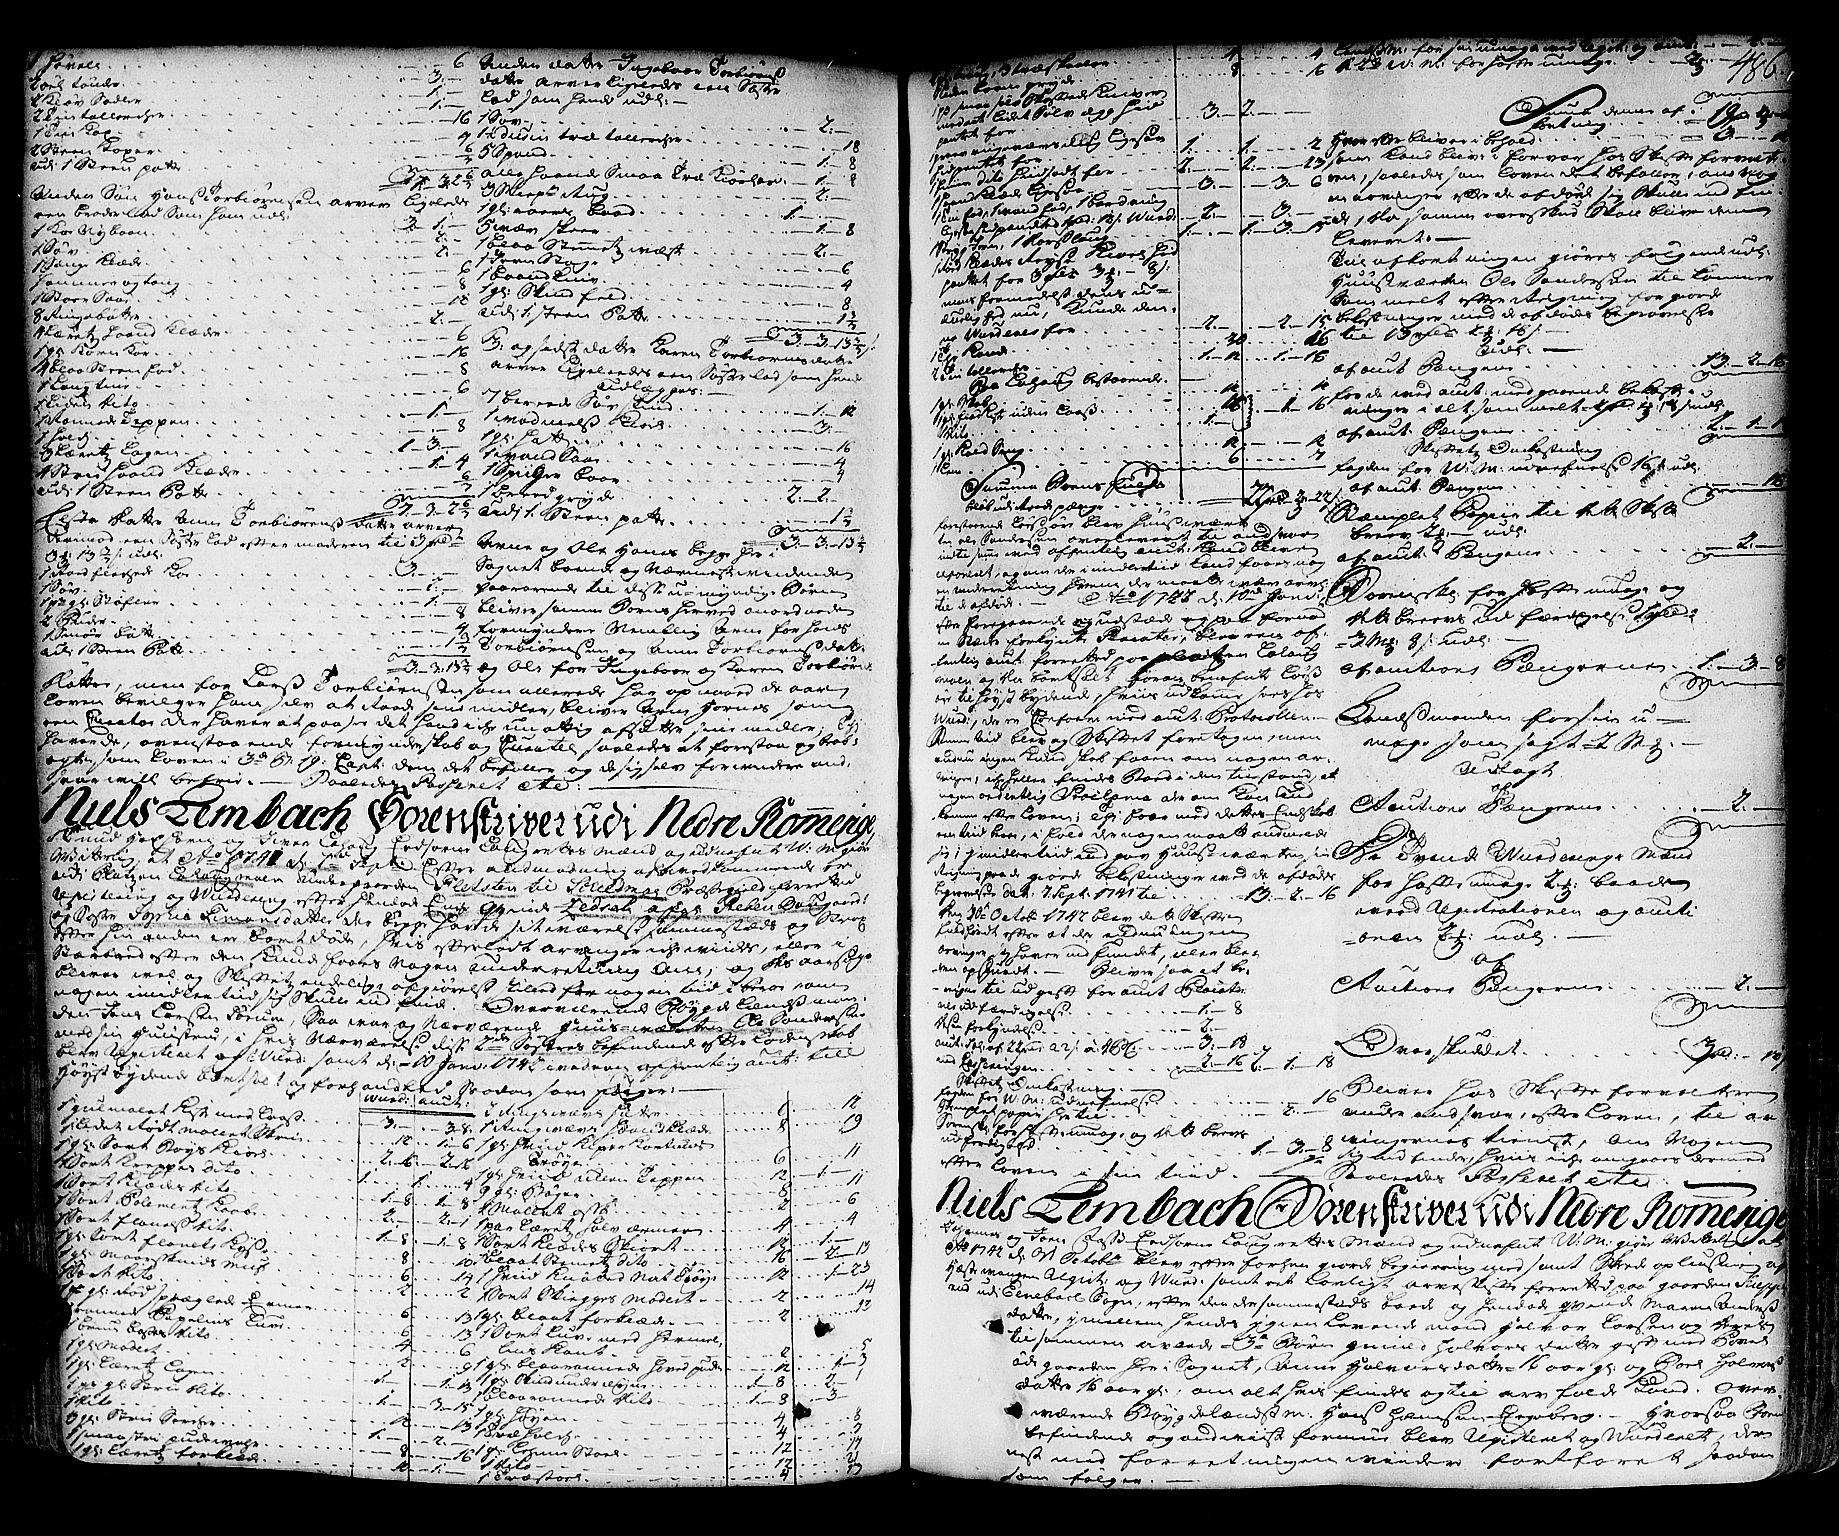 SAO, Nedre Romerike sorenskriveri, H/Hd/Hda/L0006a: Skifteprotokoll, 1739-1747, s. 485b-486a